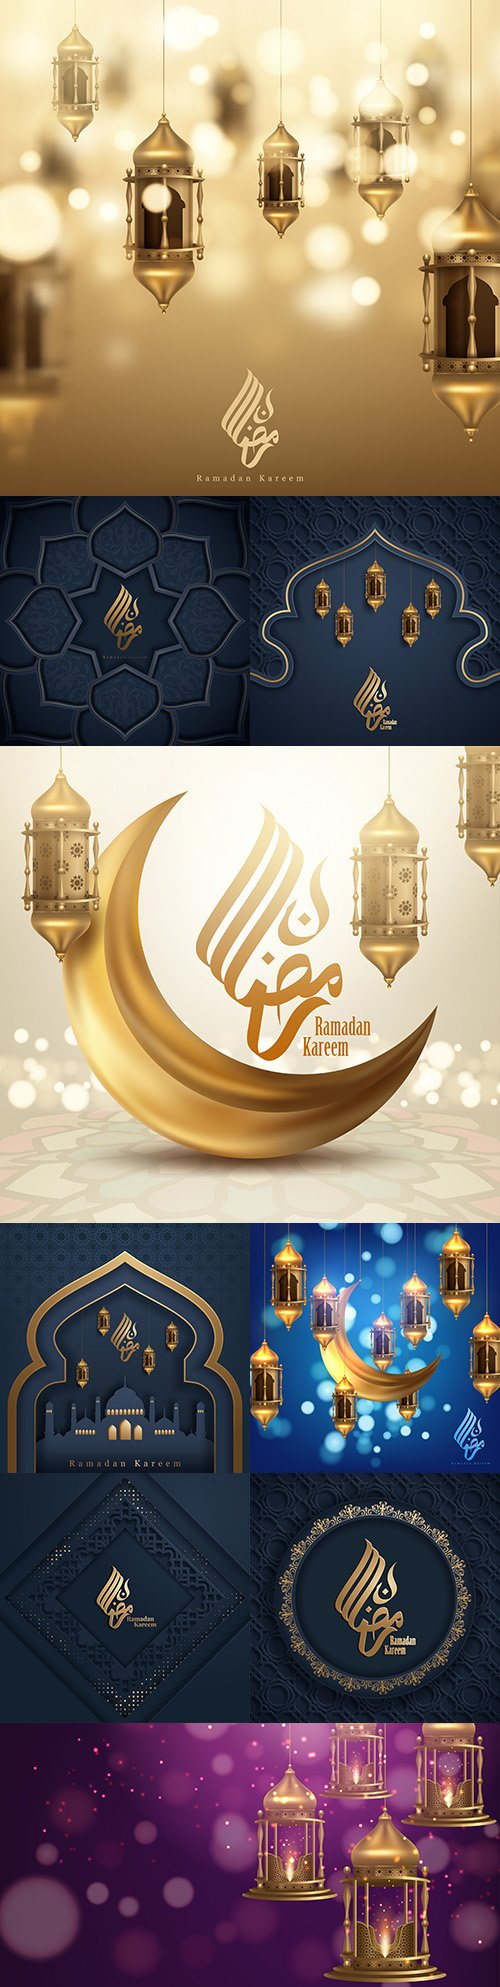 Eid Mubarak and Ramadan Kareem gold design with calligraphy 2